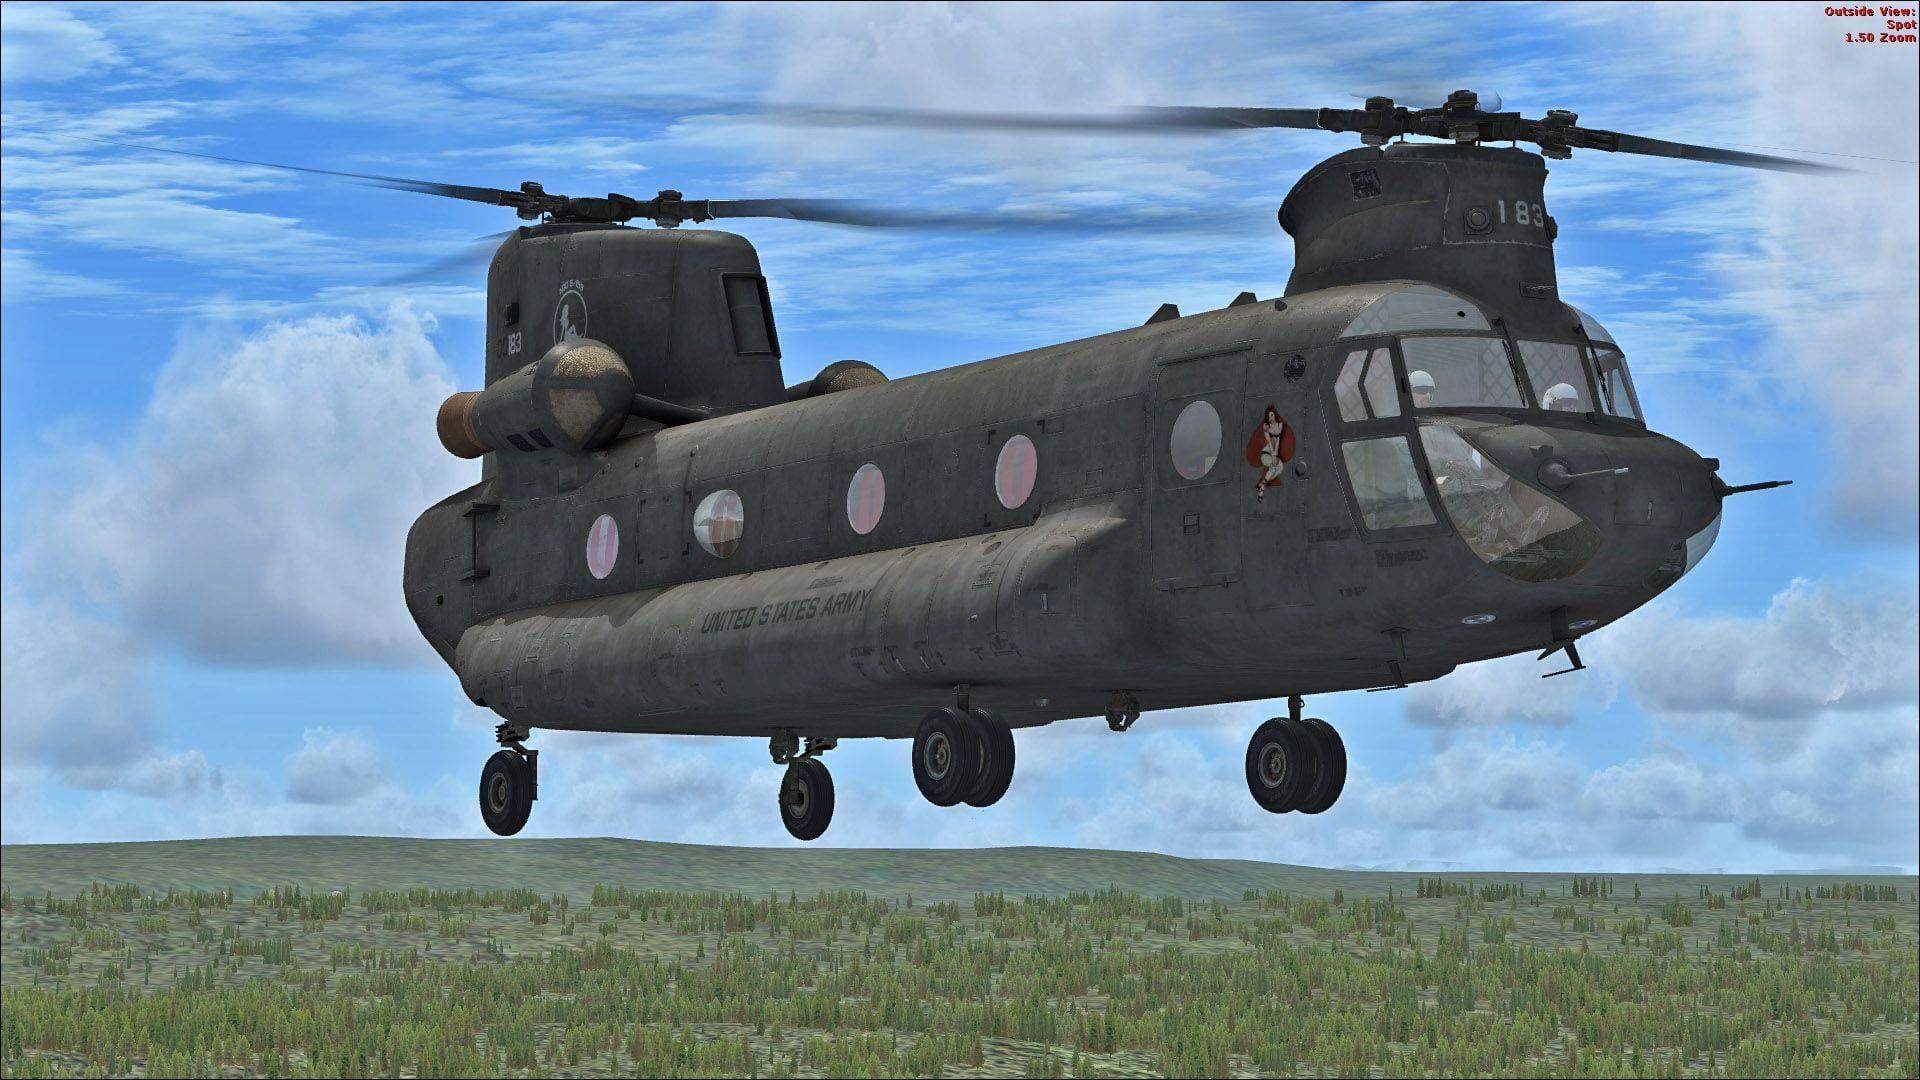 More Nemeth Designs updates: AW109, CH-47 and S-65 Skycrane